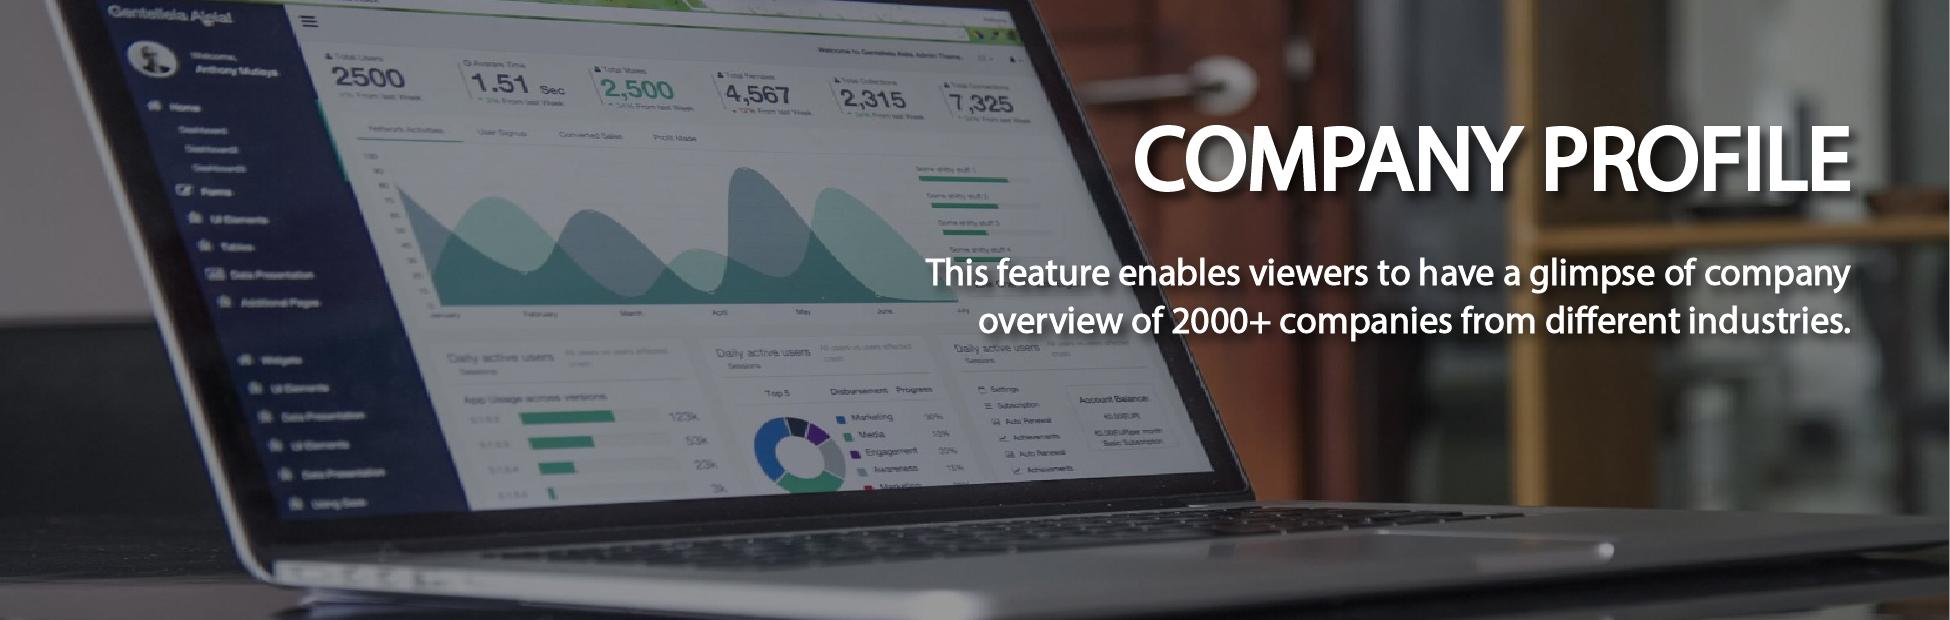 Company Profile-01-01-01